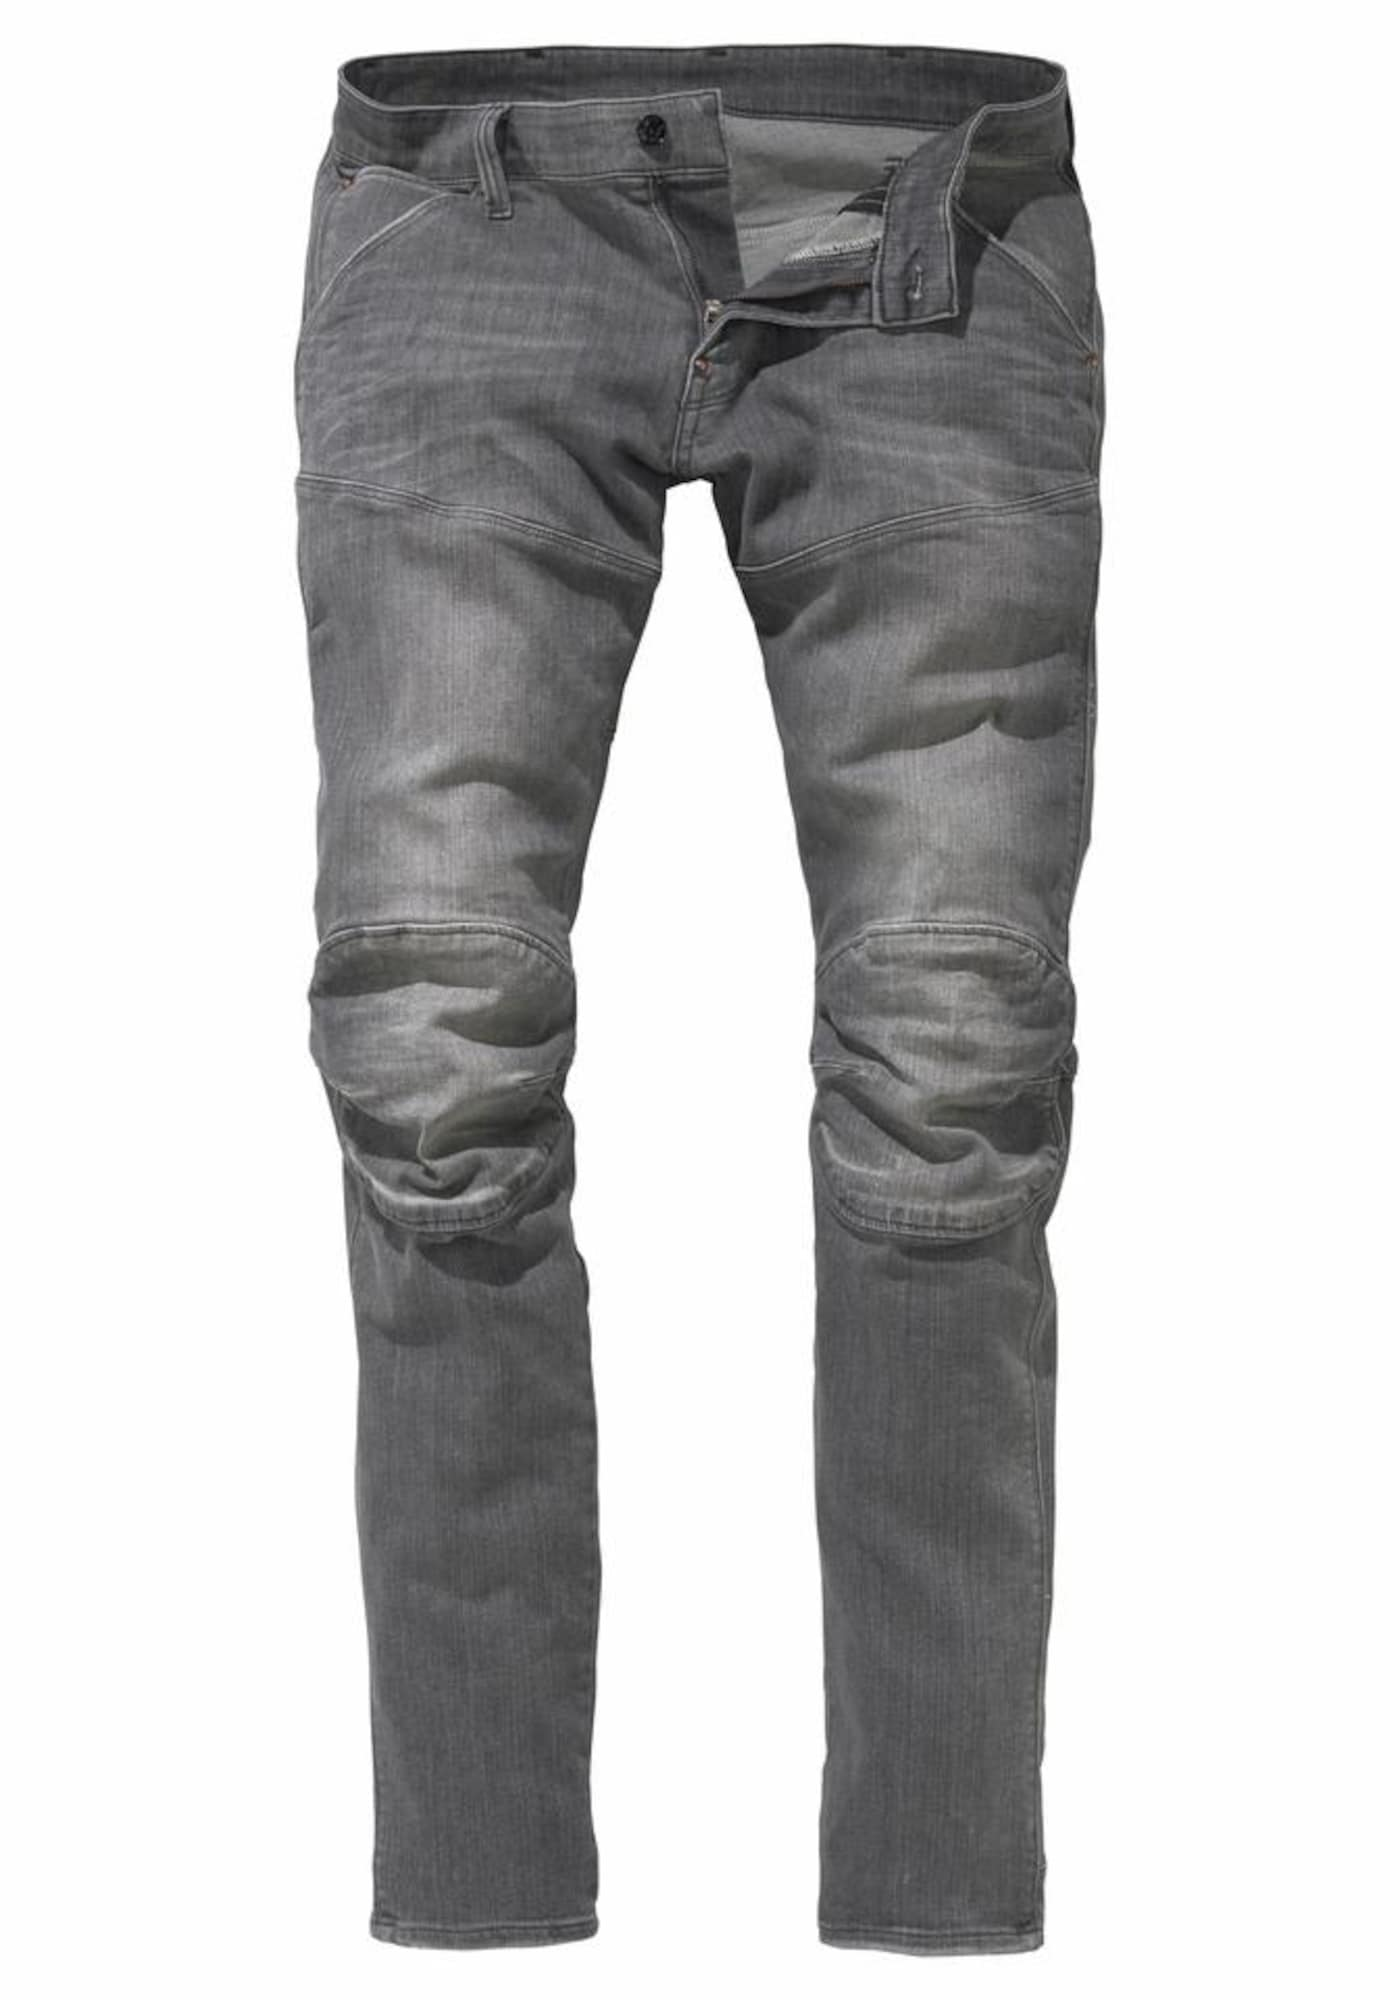 G-STAR RAW Heren Jeans 5620 Elwood 3D Super Slim grey denim